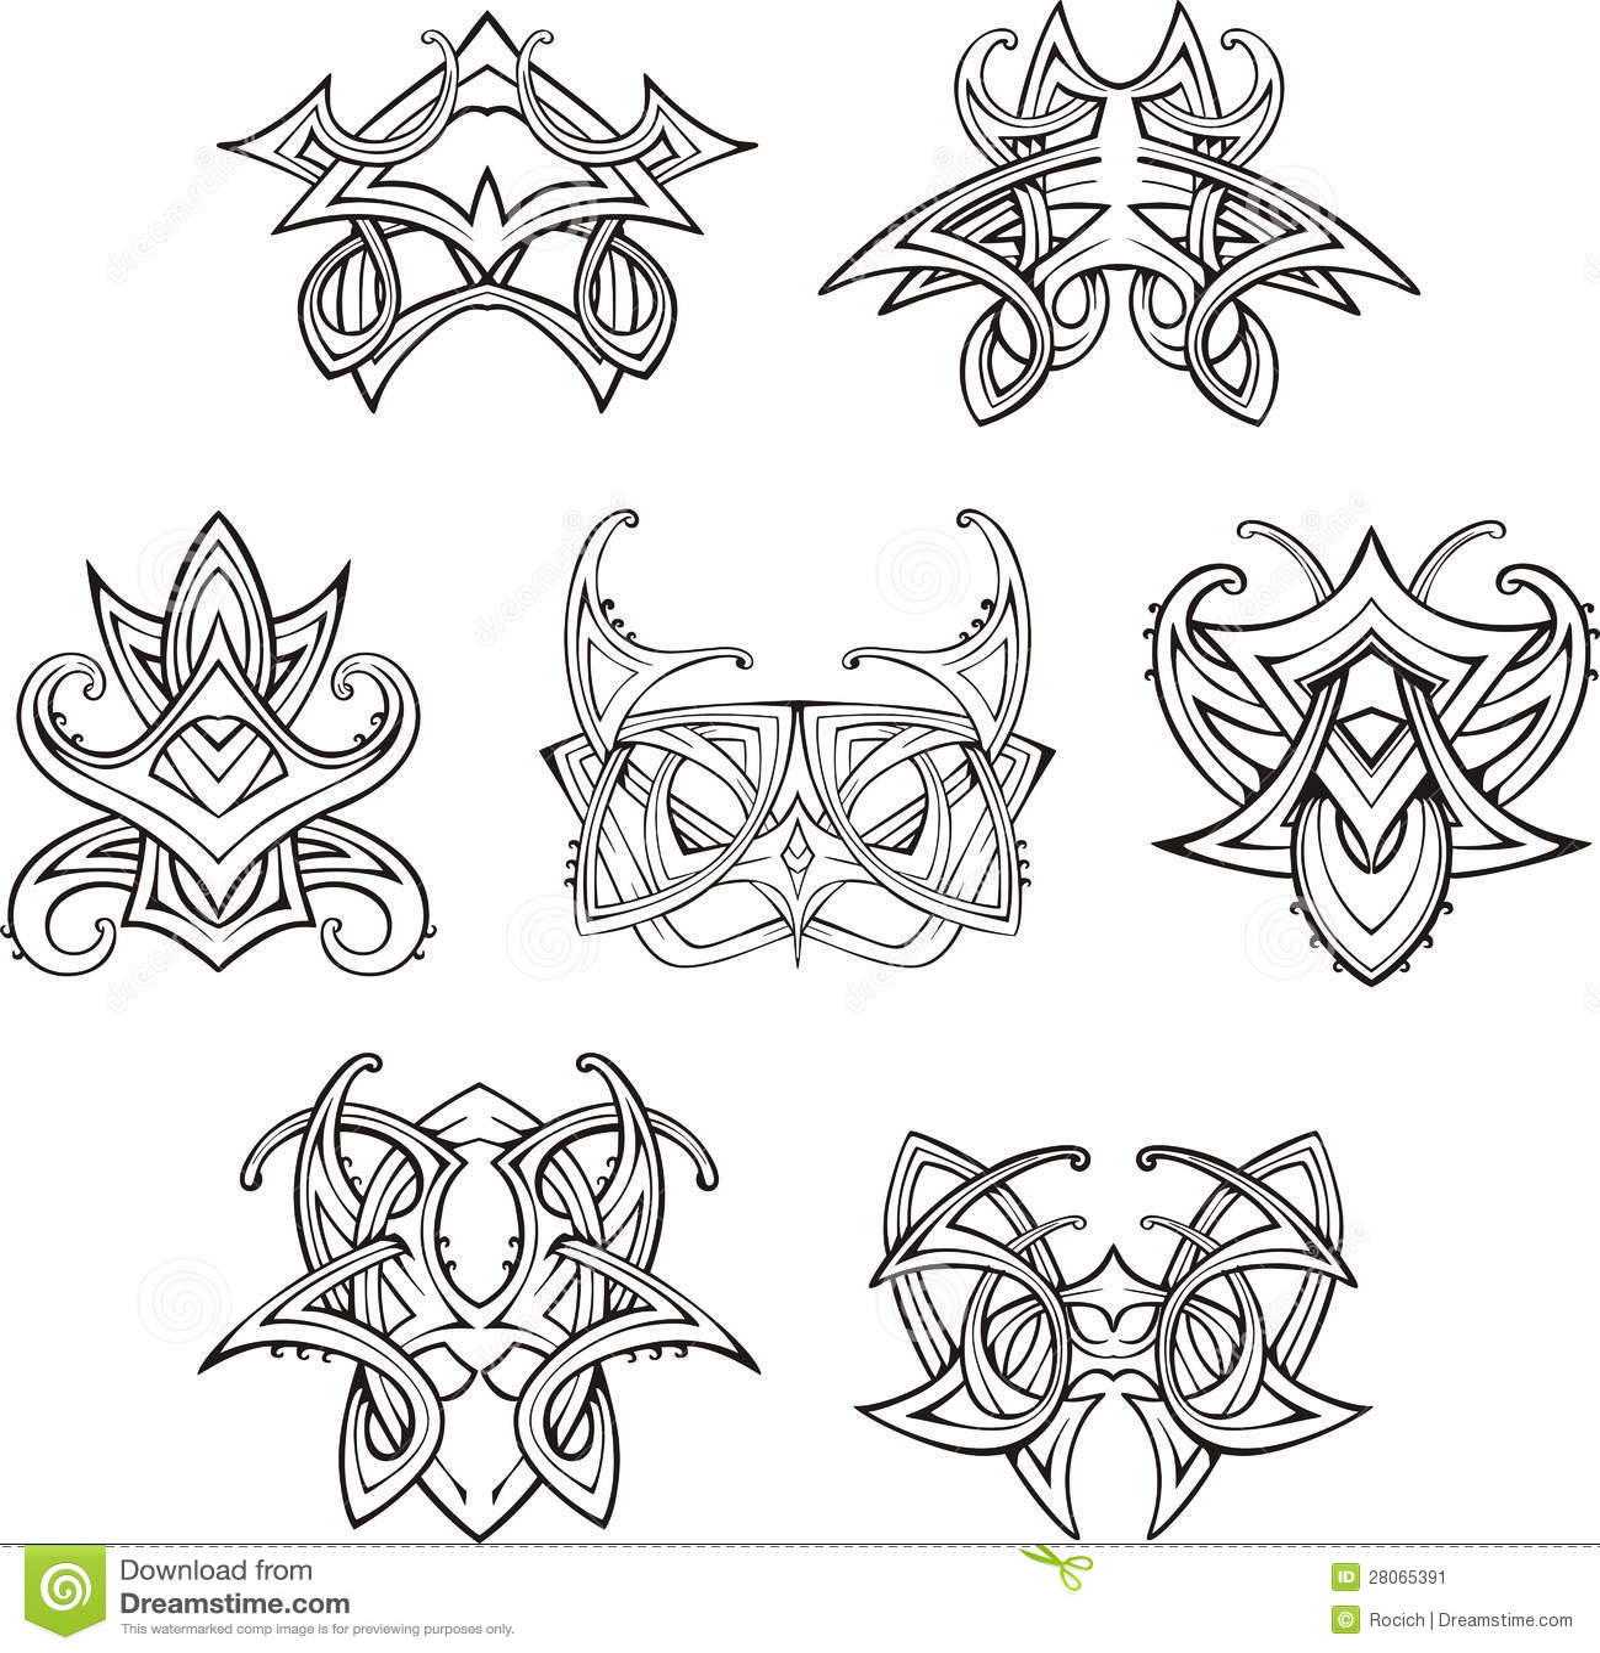 symmetric tribal knot tattoos stock image image 28065391. Black Bedroom Furniture Sets. Home Design Ideas